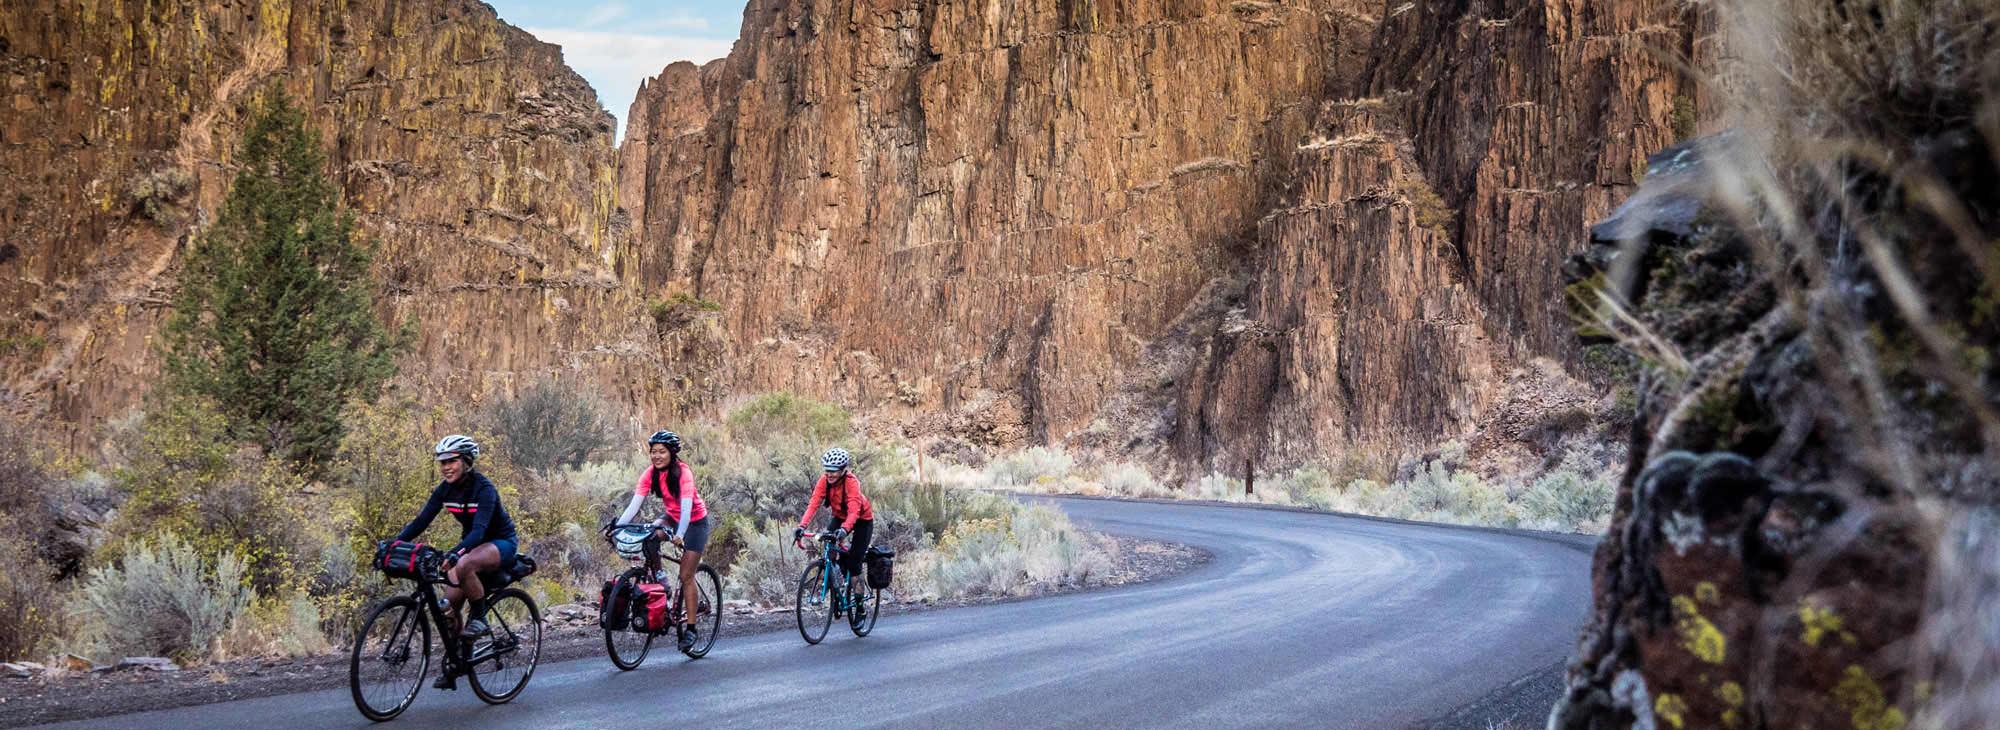 Electric Riding Vehicle >> Ride the Oregon Scenic Bikeways - Travel Oregon